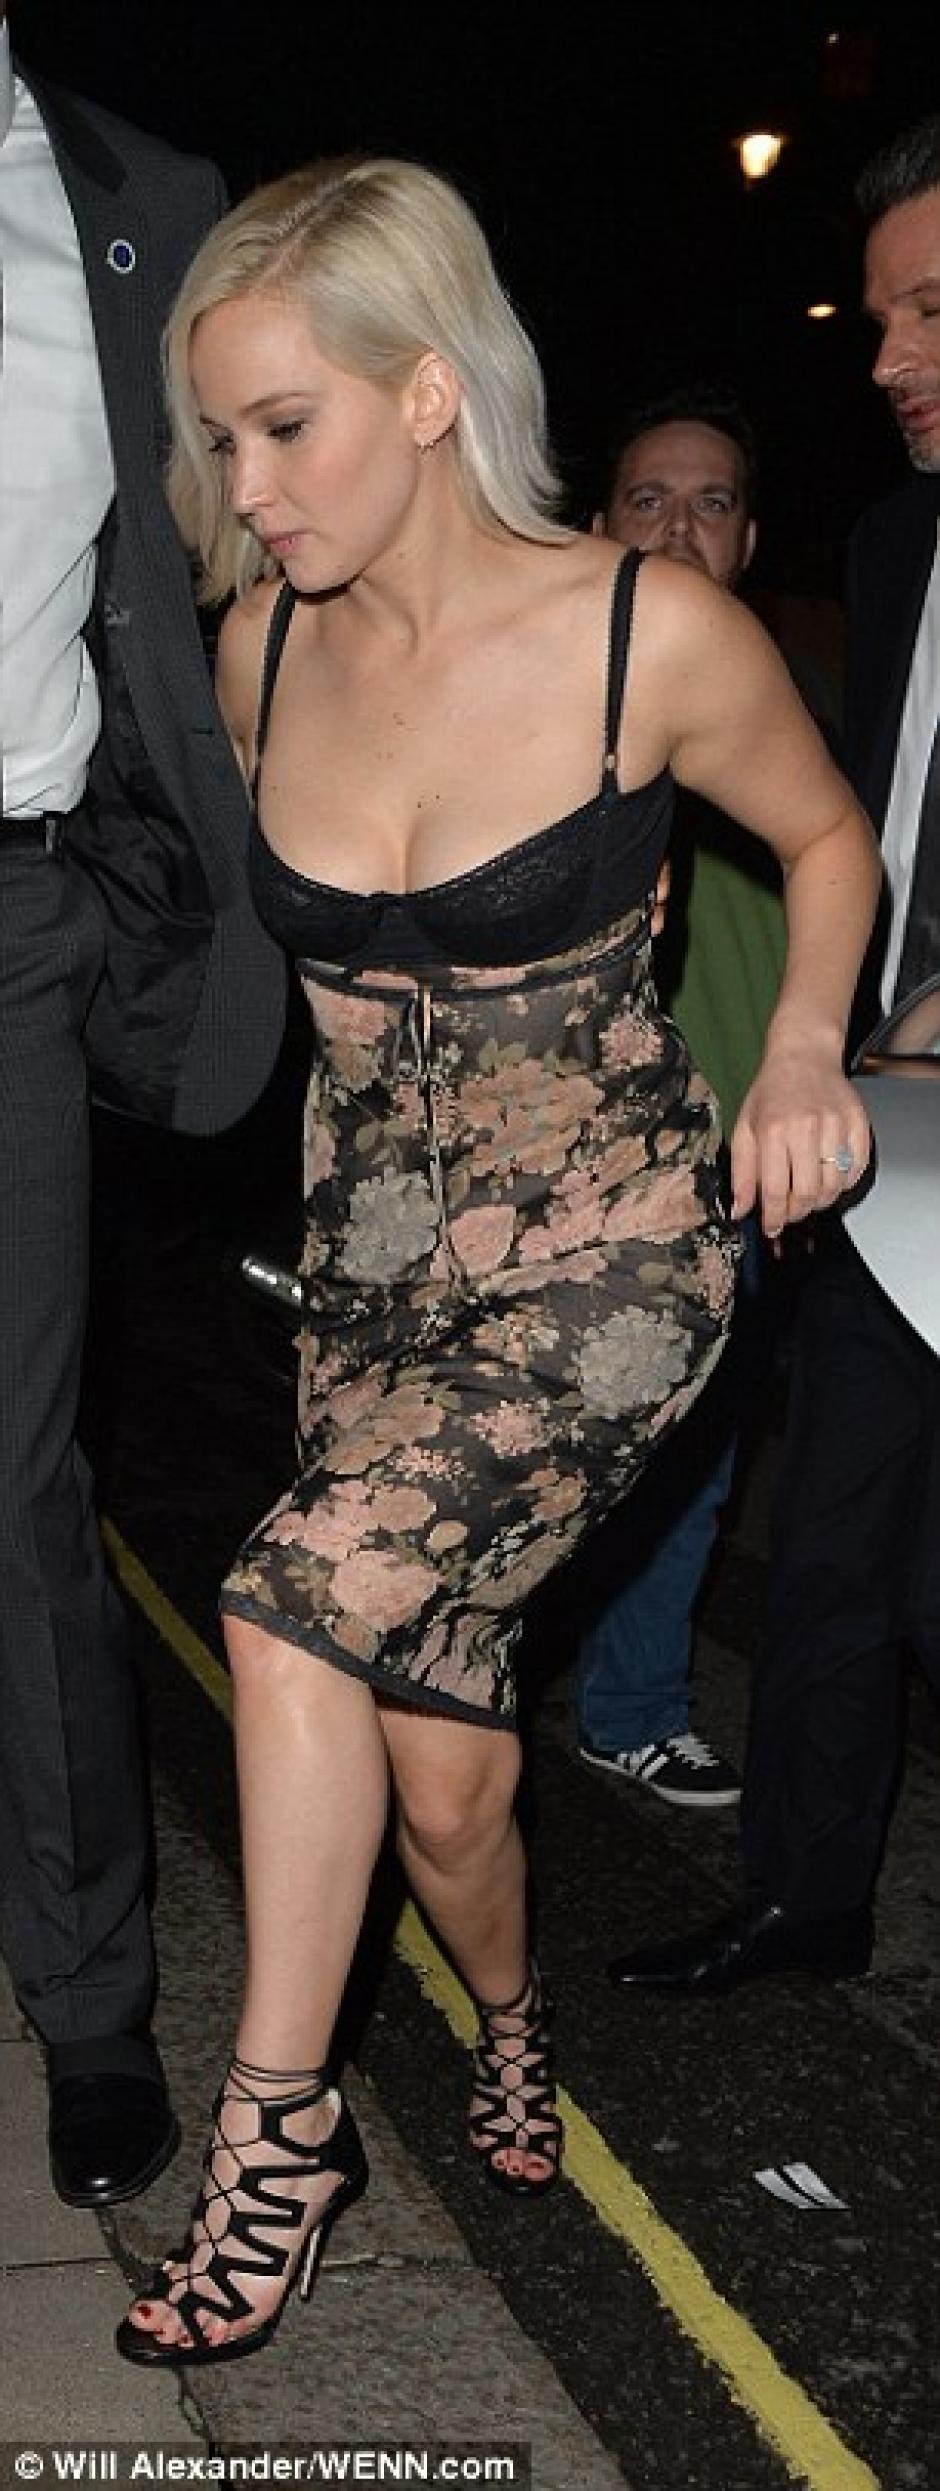 La actriz se apuró a ingresar. (Foto: Splash news)